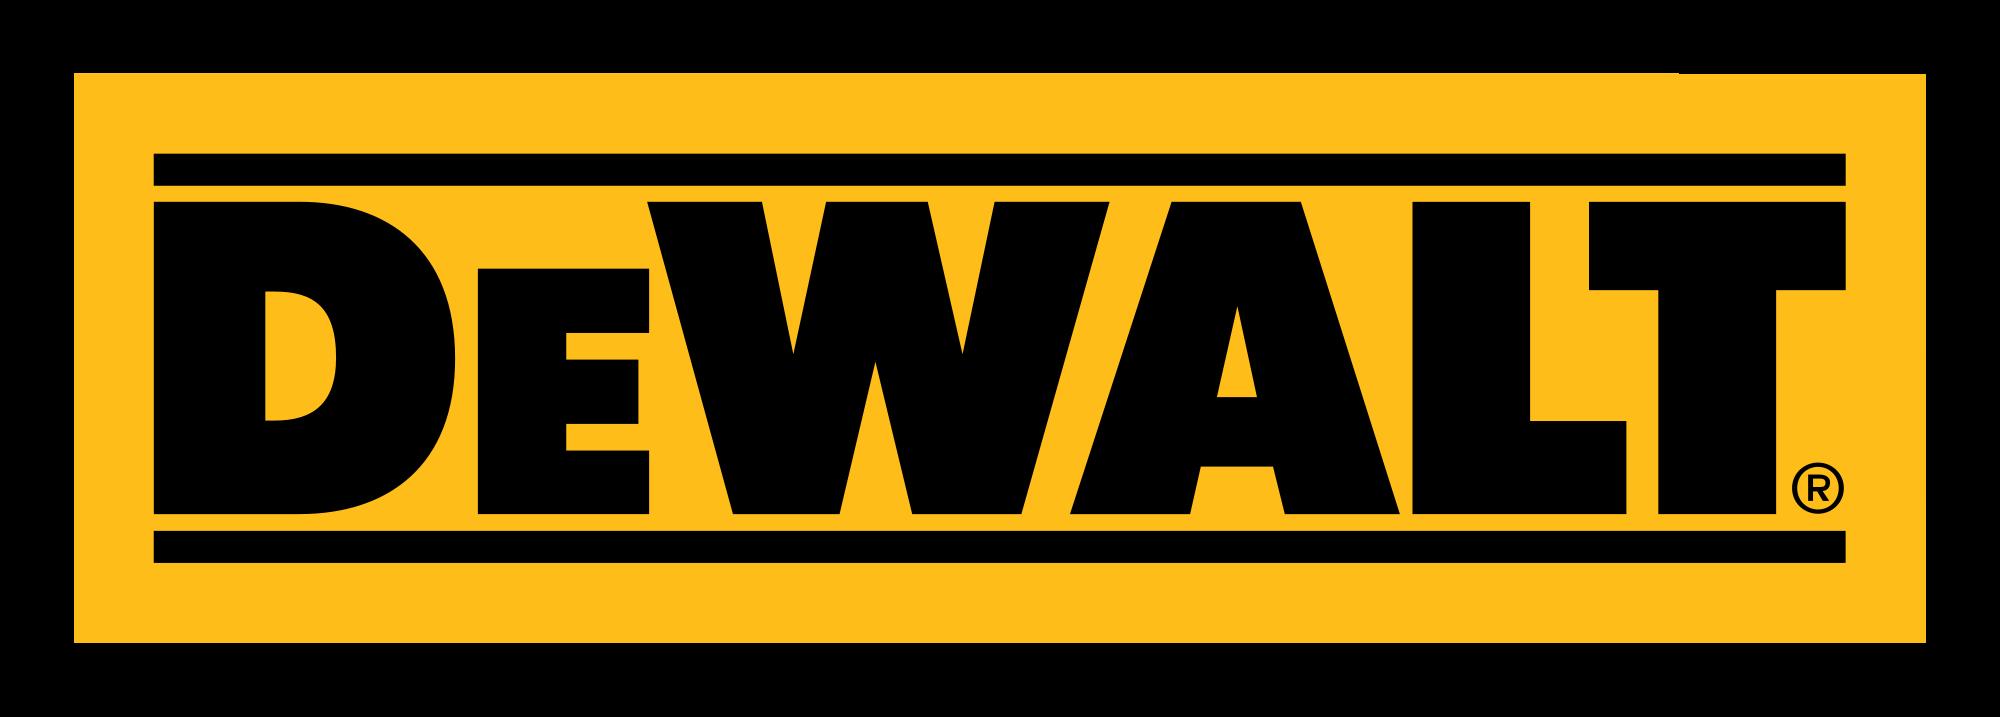 Dewalt Logo Bigmat Roca